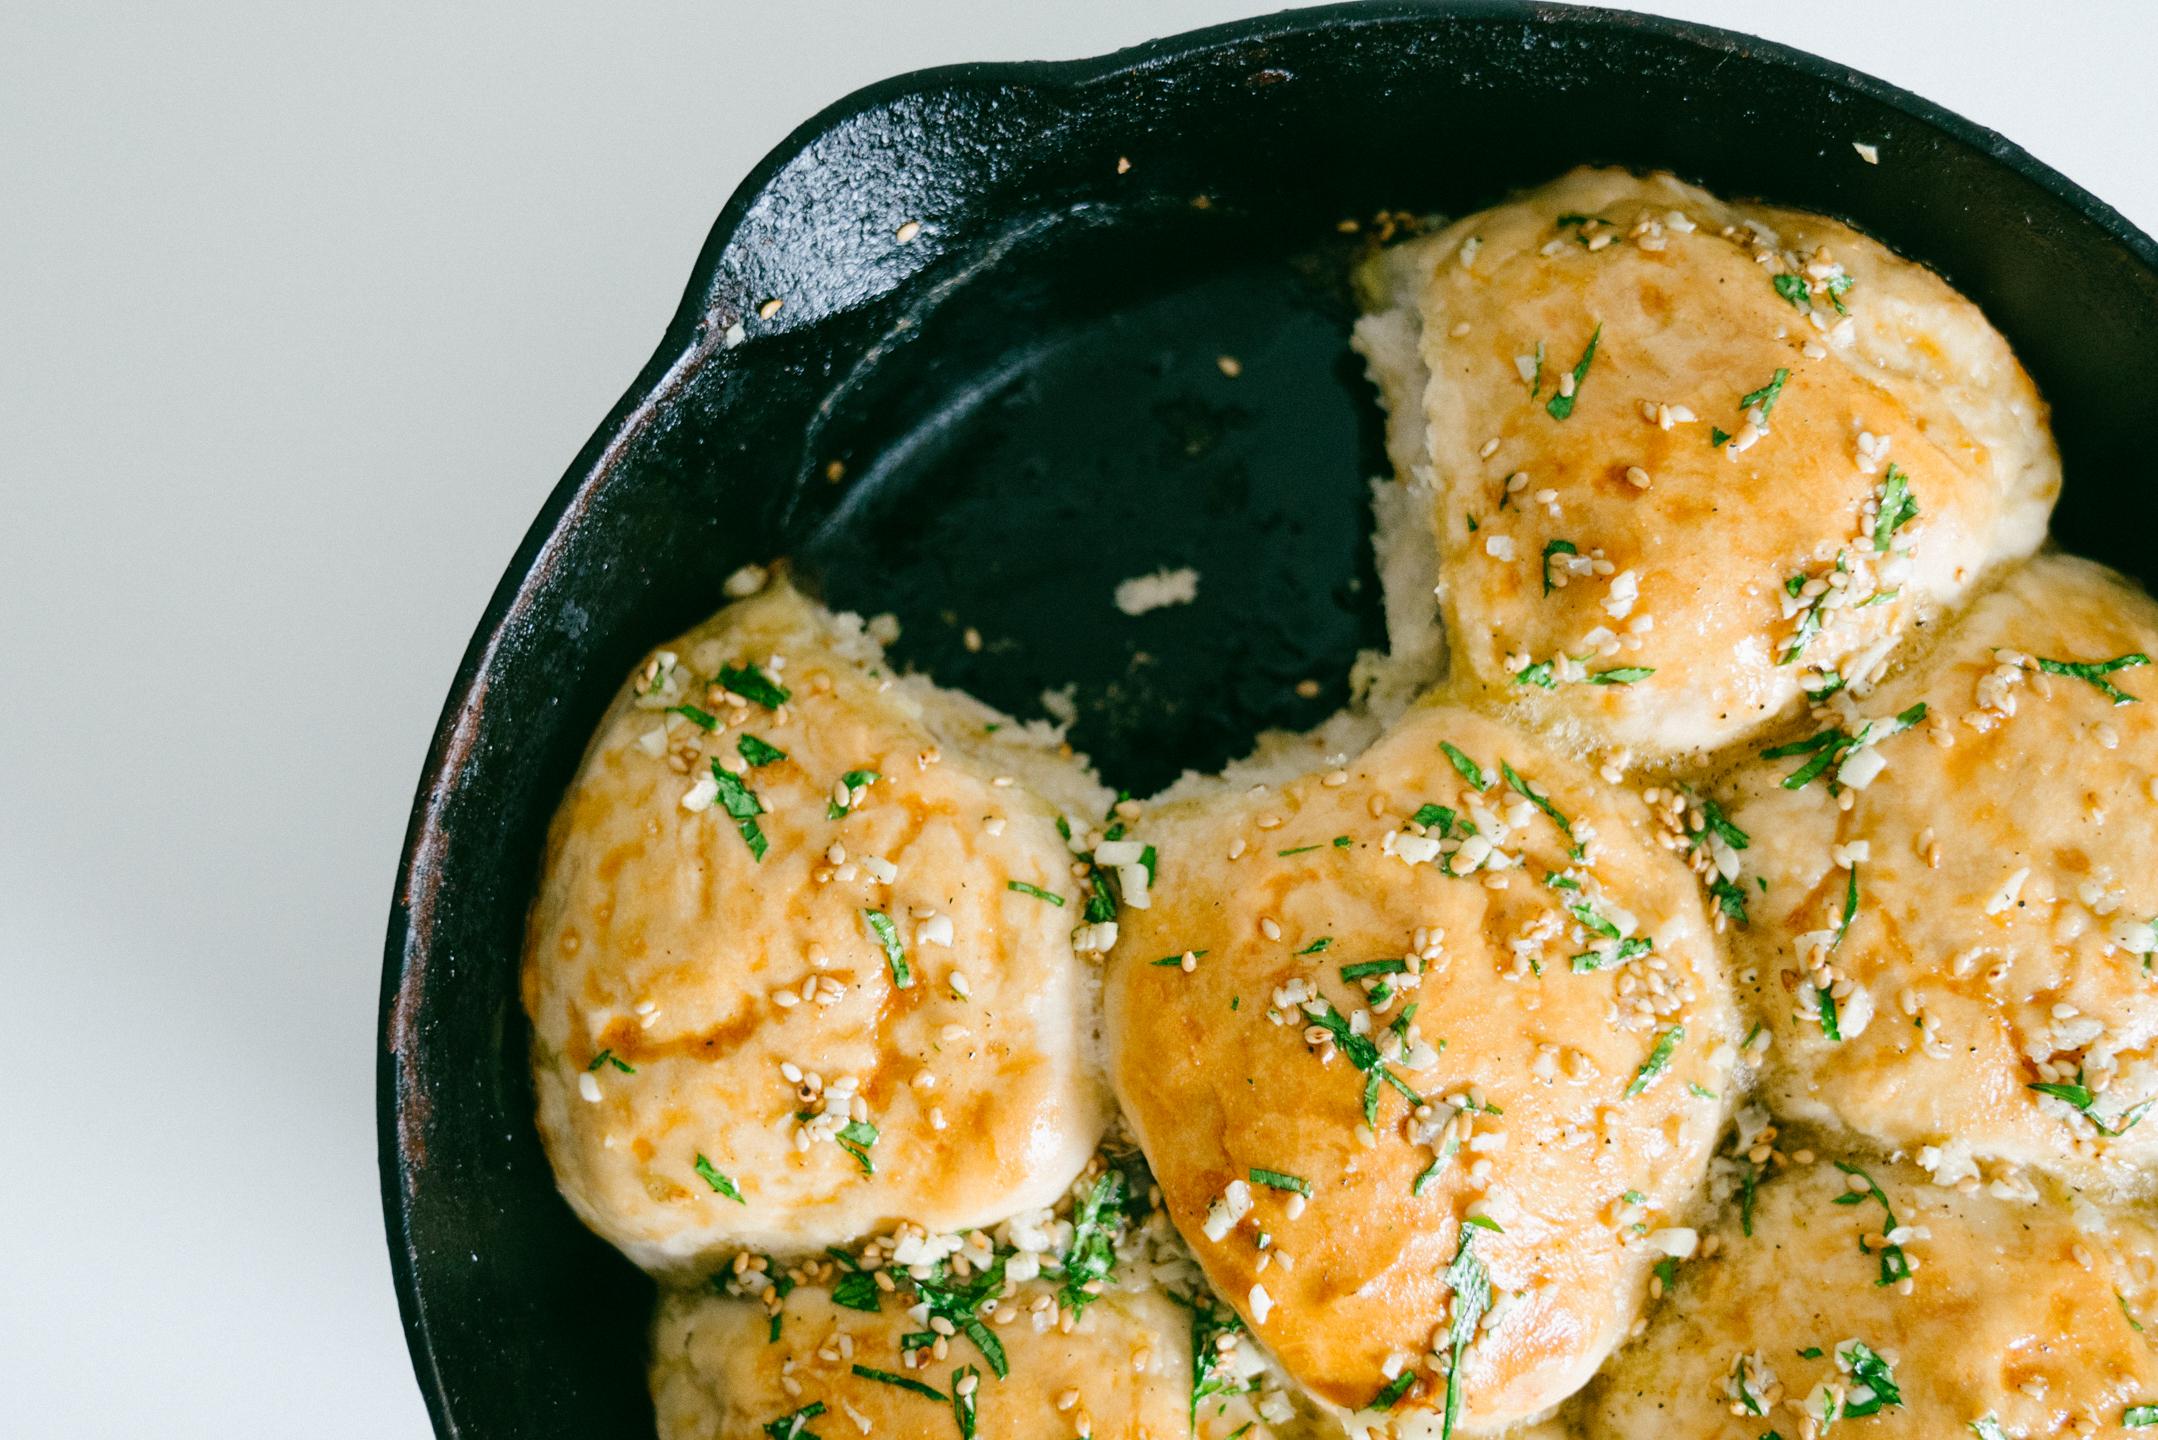 Garlic Cast Iron Skillet Soft Rolls (Pampushky)